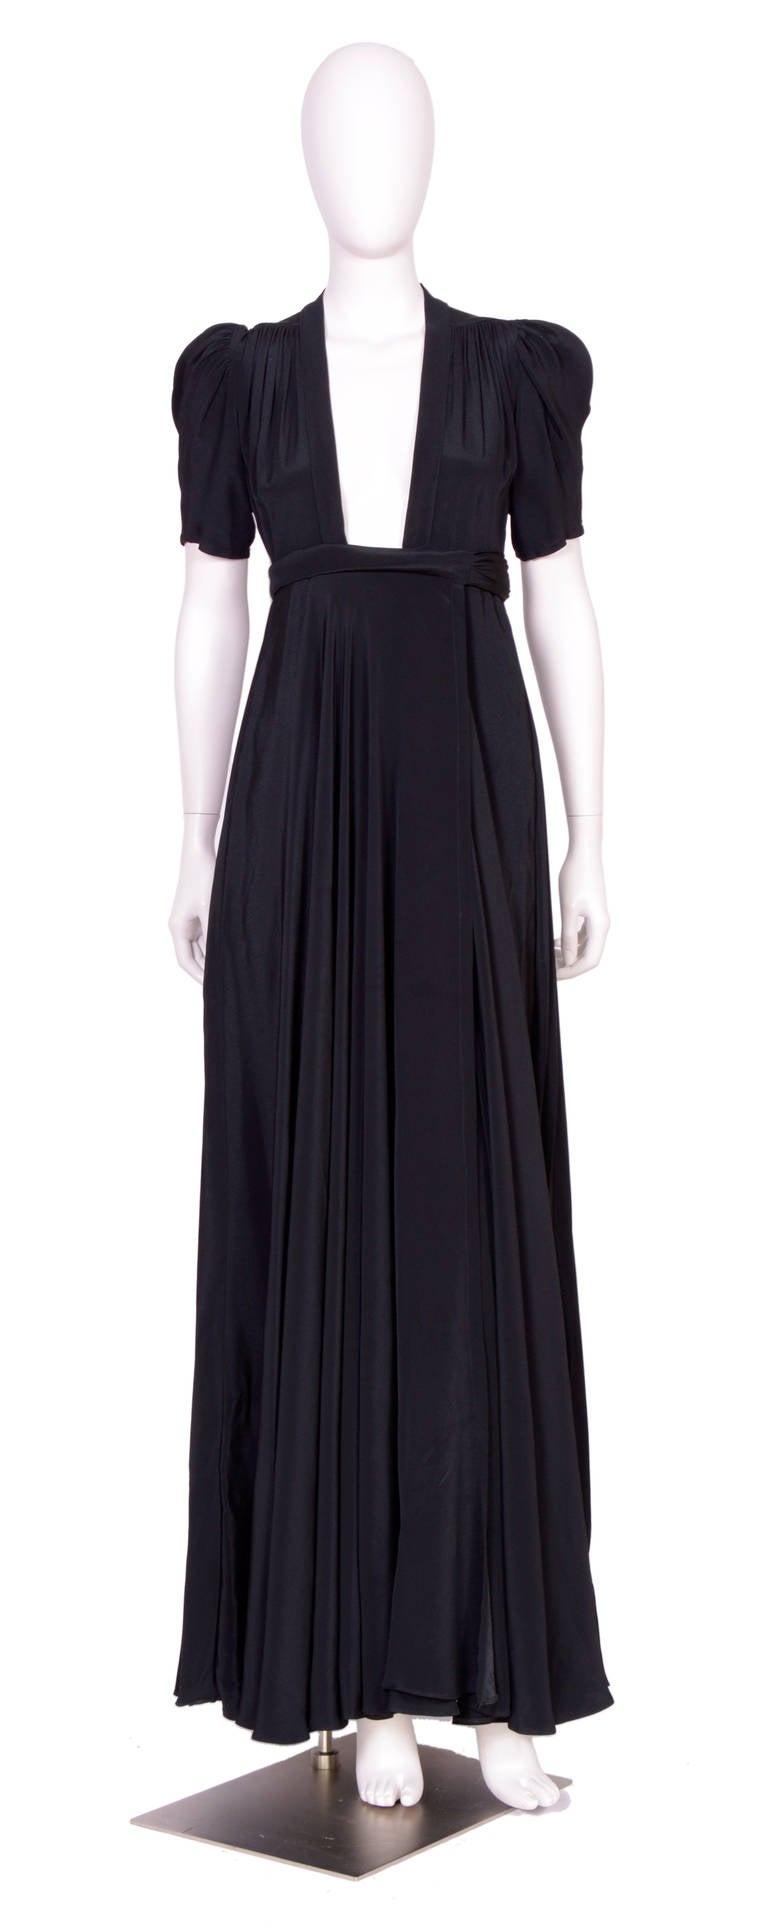 Vintage OSSIE CLARK for QUORUM Black Wrap Dress 4